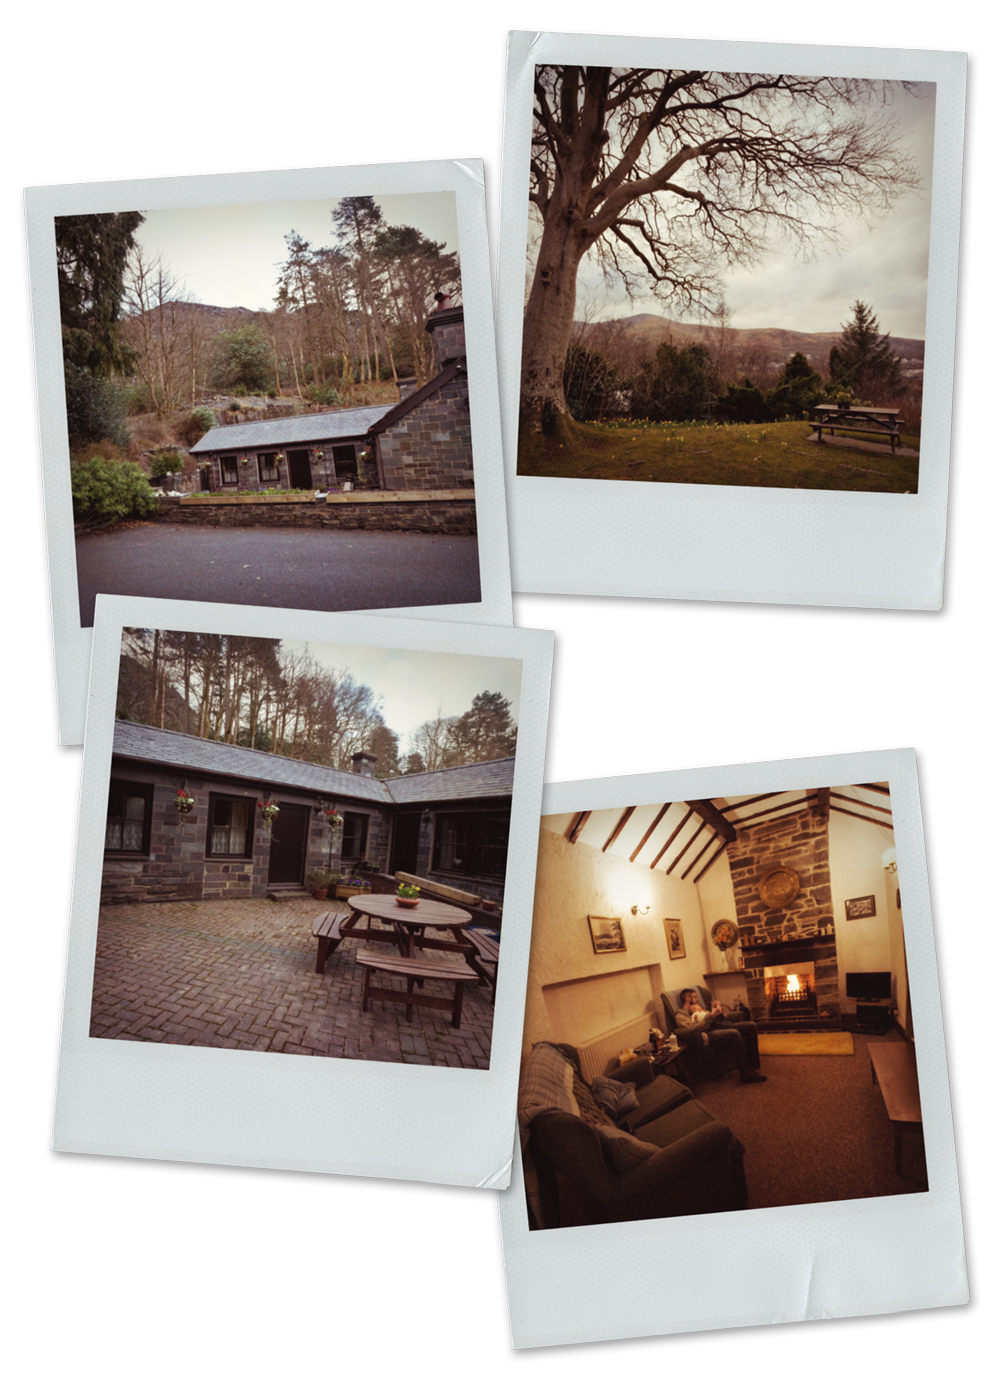 A-snowdonia-03-cottage